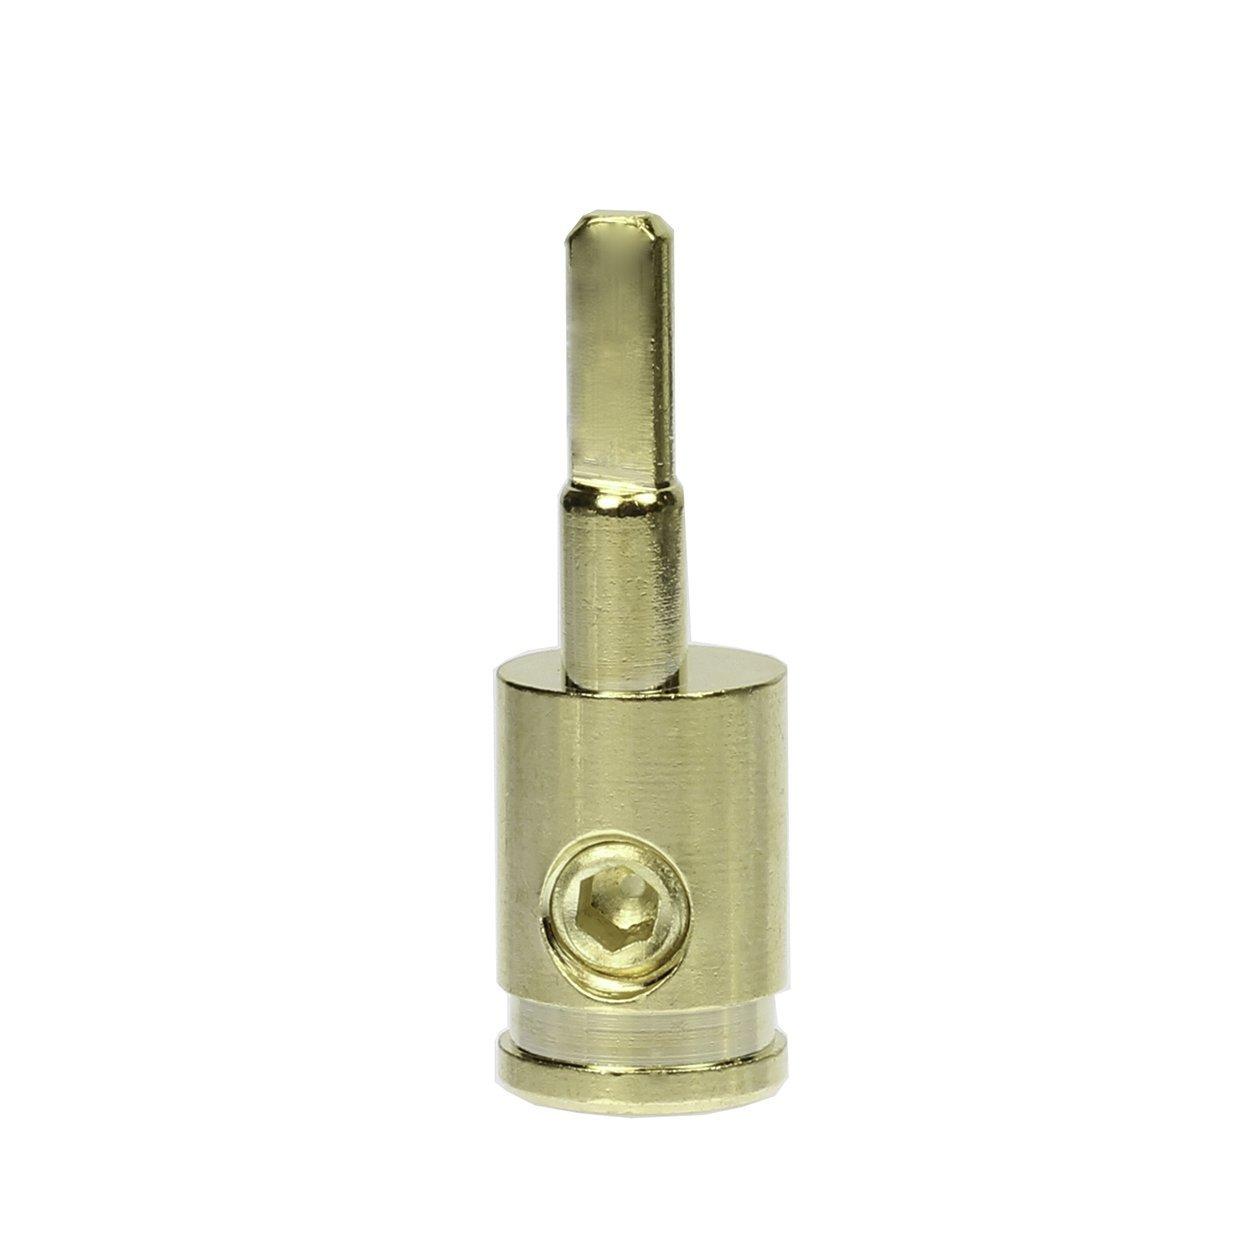 Pair (2) of Car Audio 4 Gauge to 8 Gauge Amp Input Gold Reducers